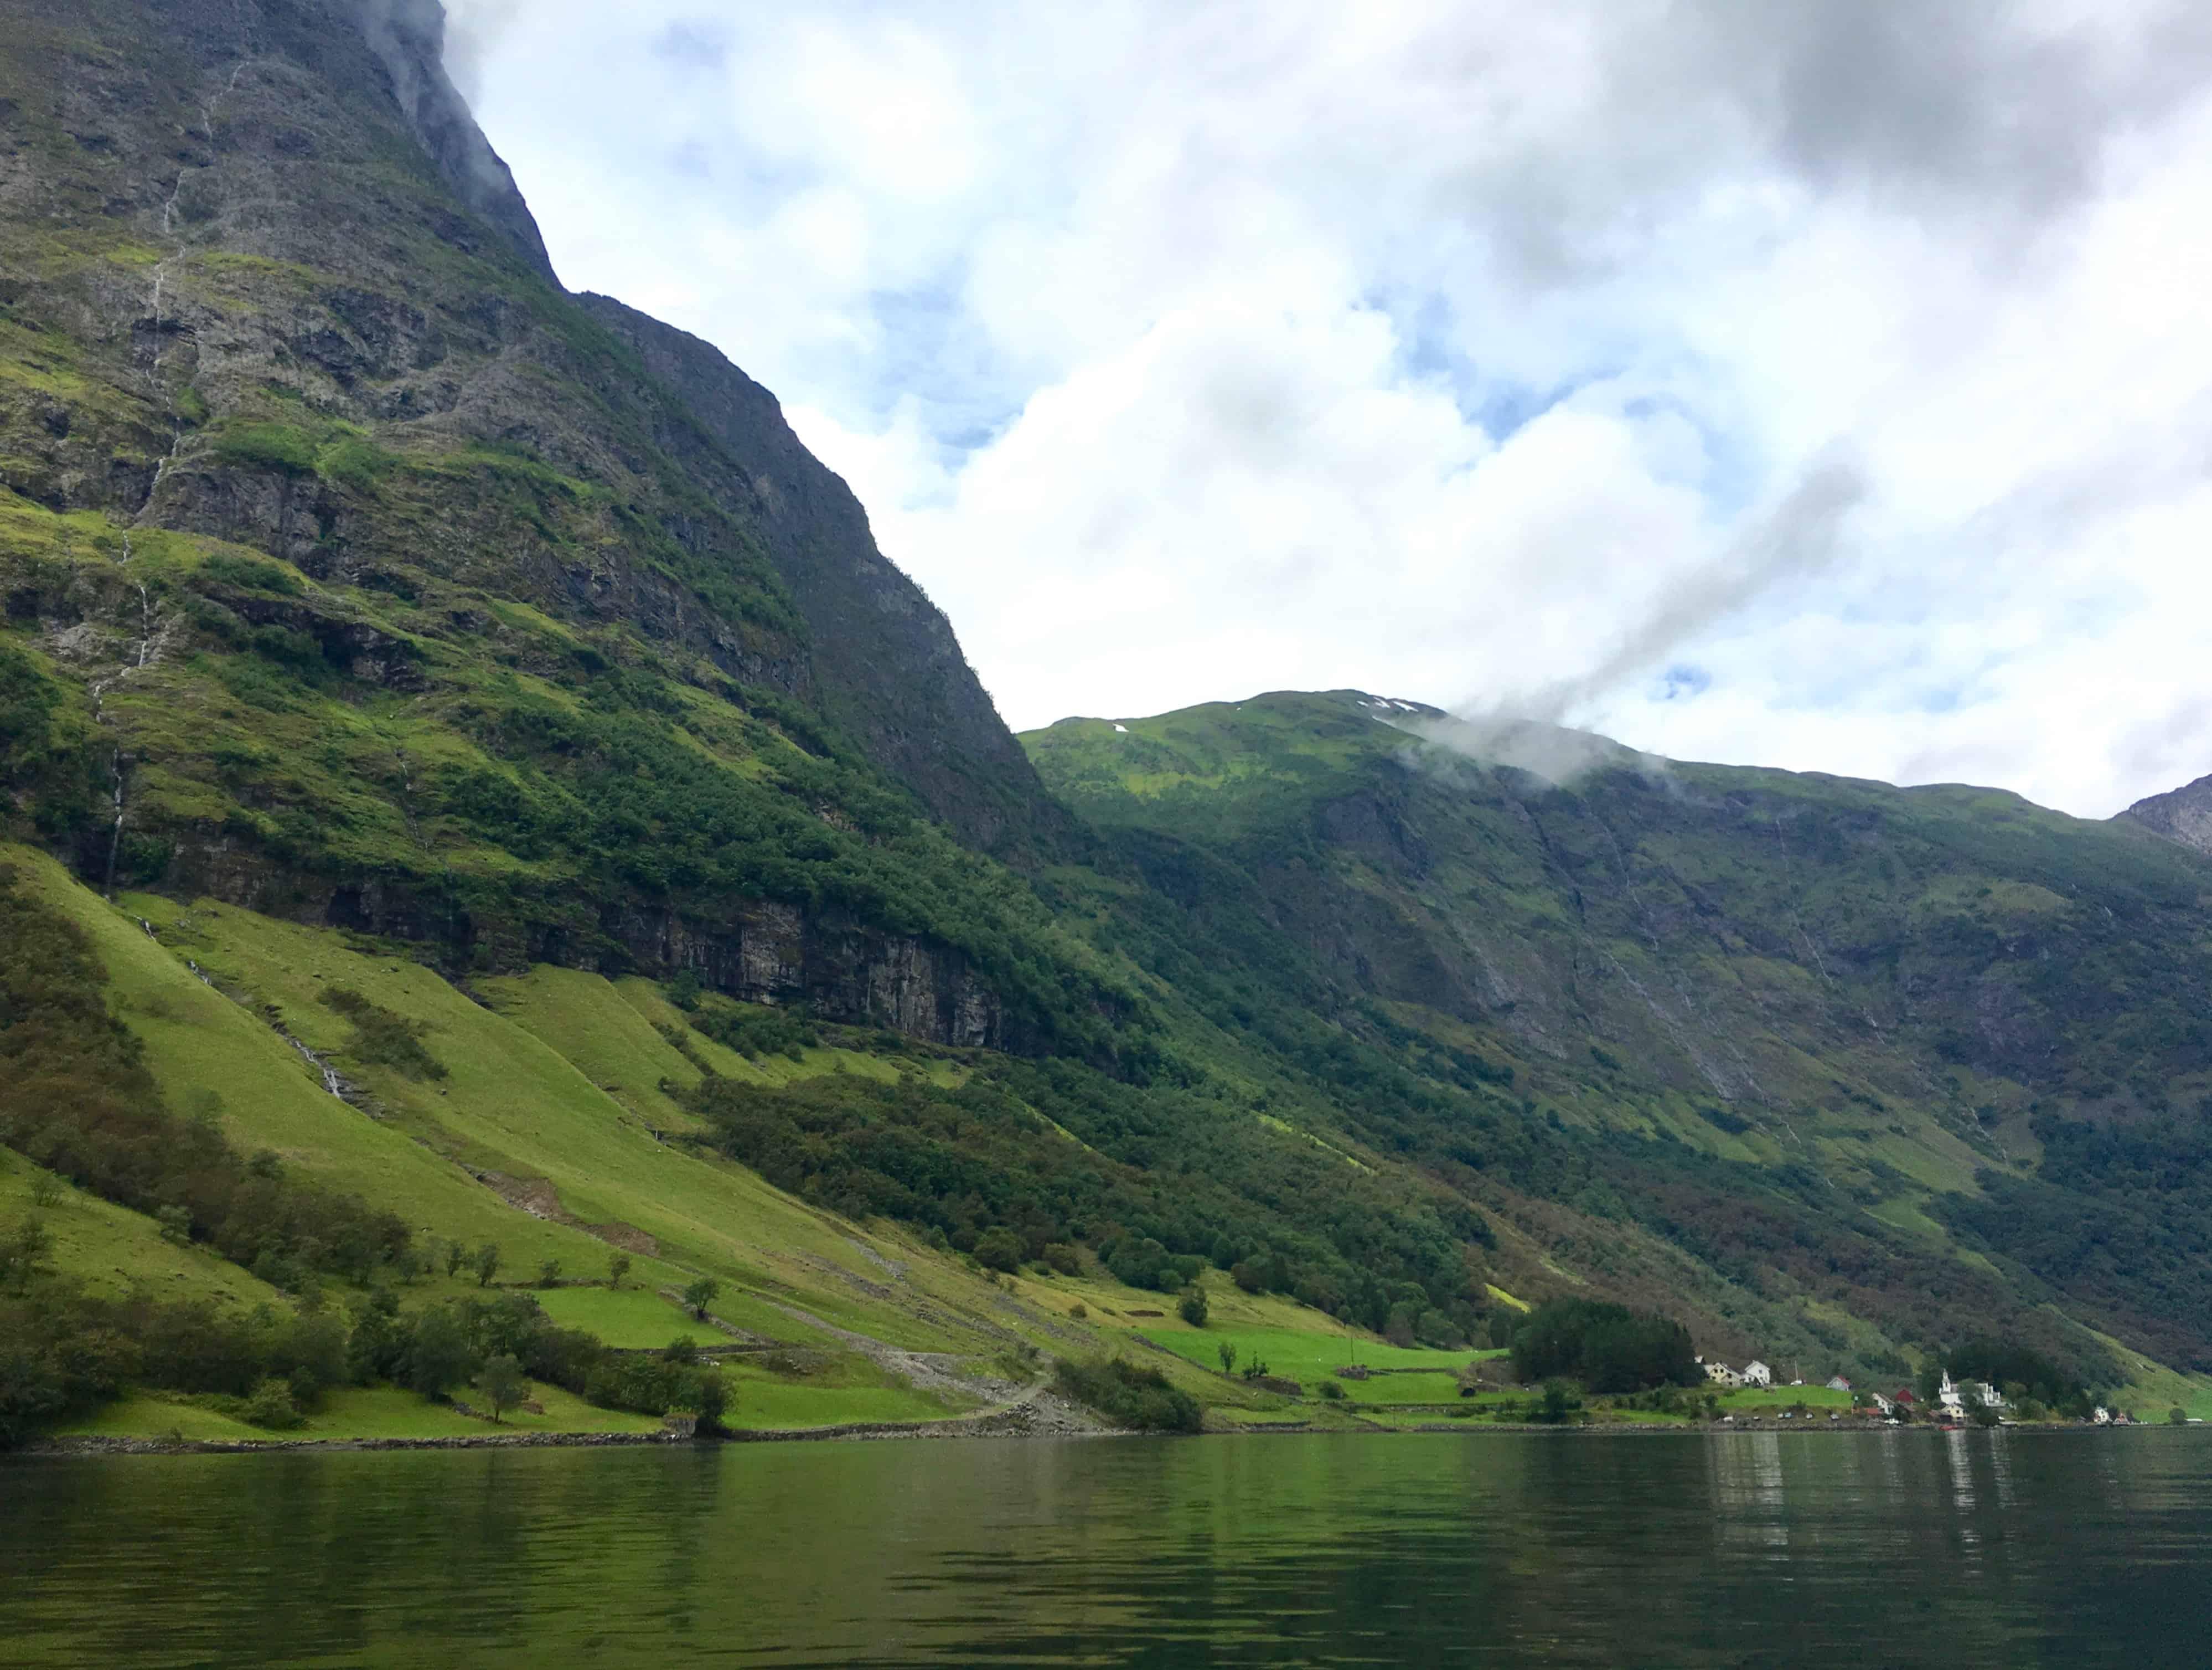 Villages dot the shores of Naeroyfjord